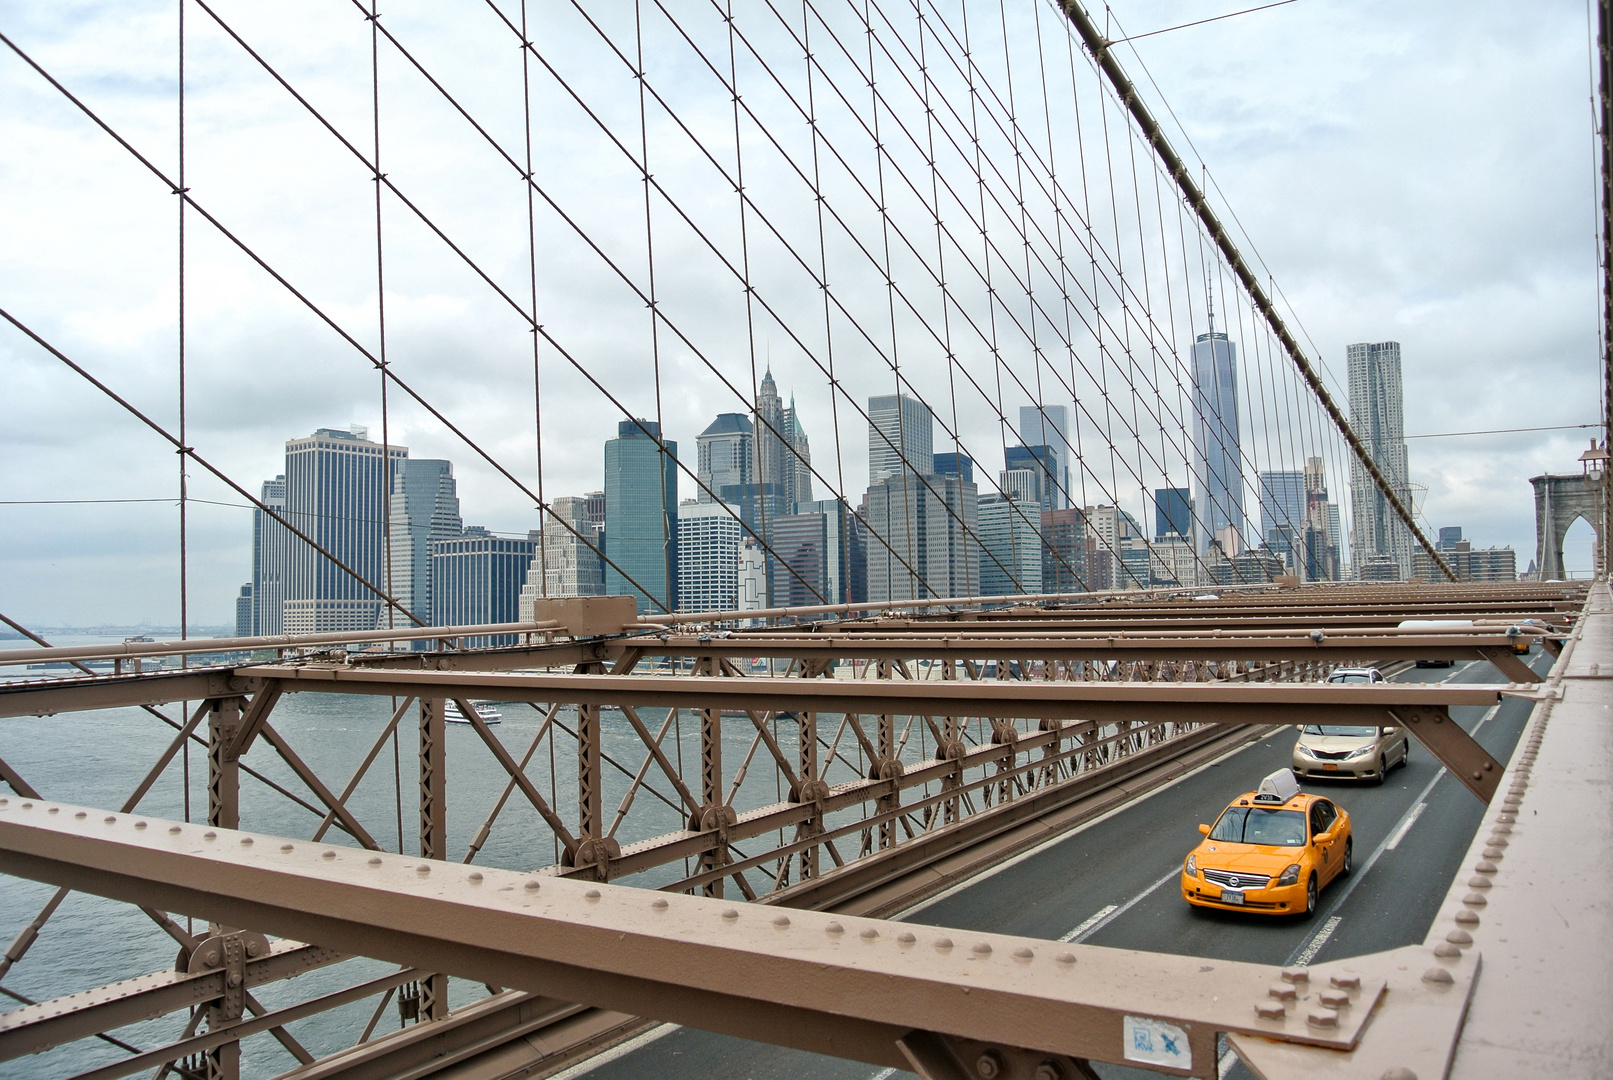 brooklyn bridge taxi